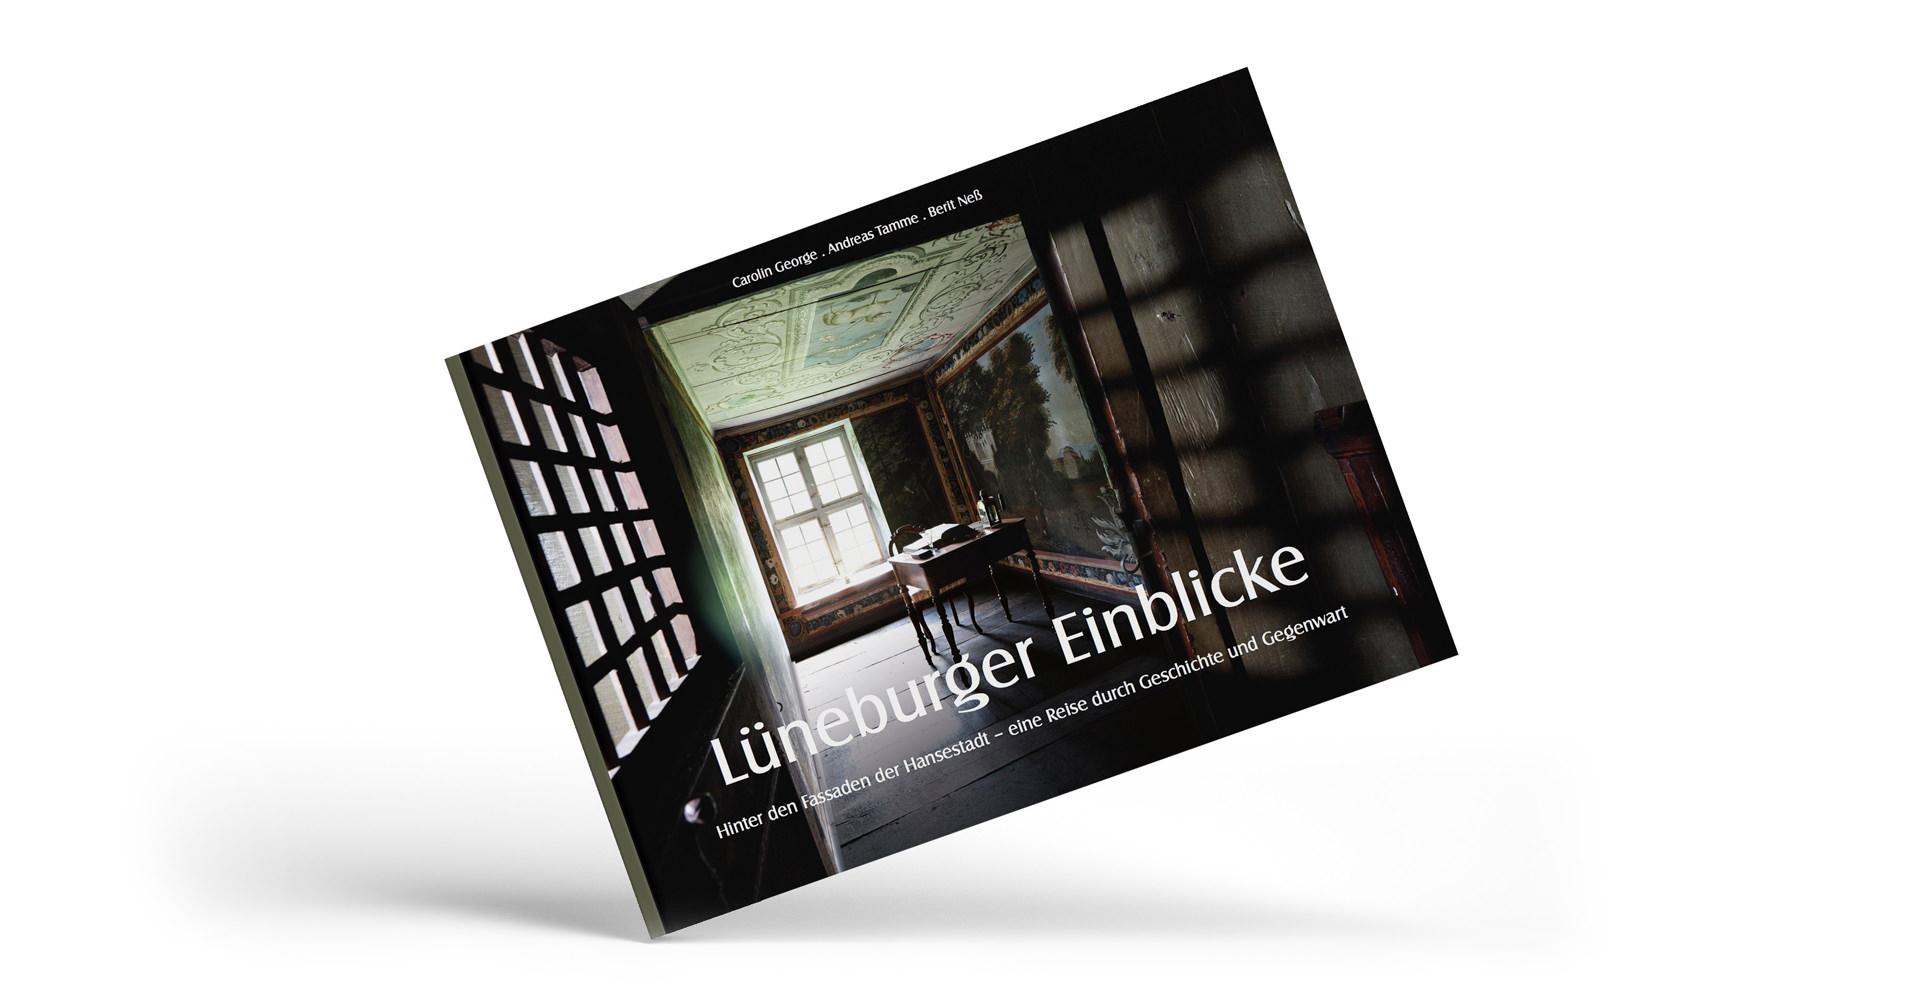 Lüneburger Einblicke